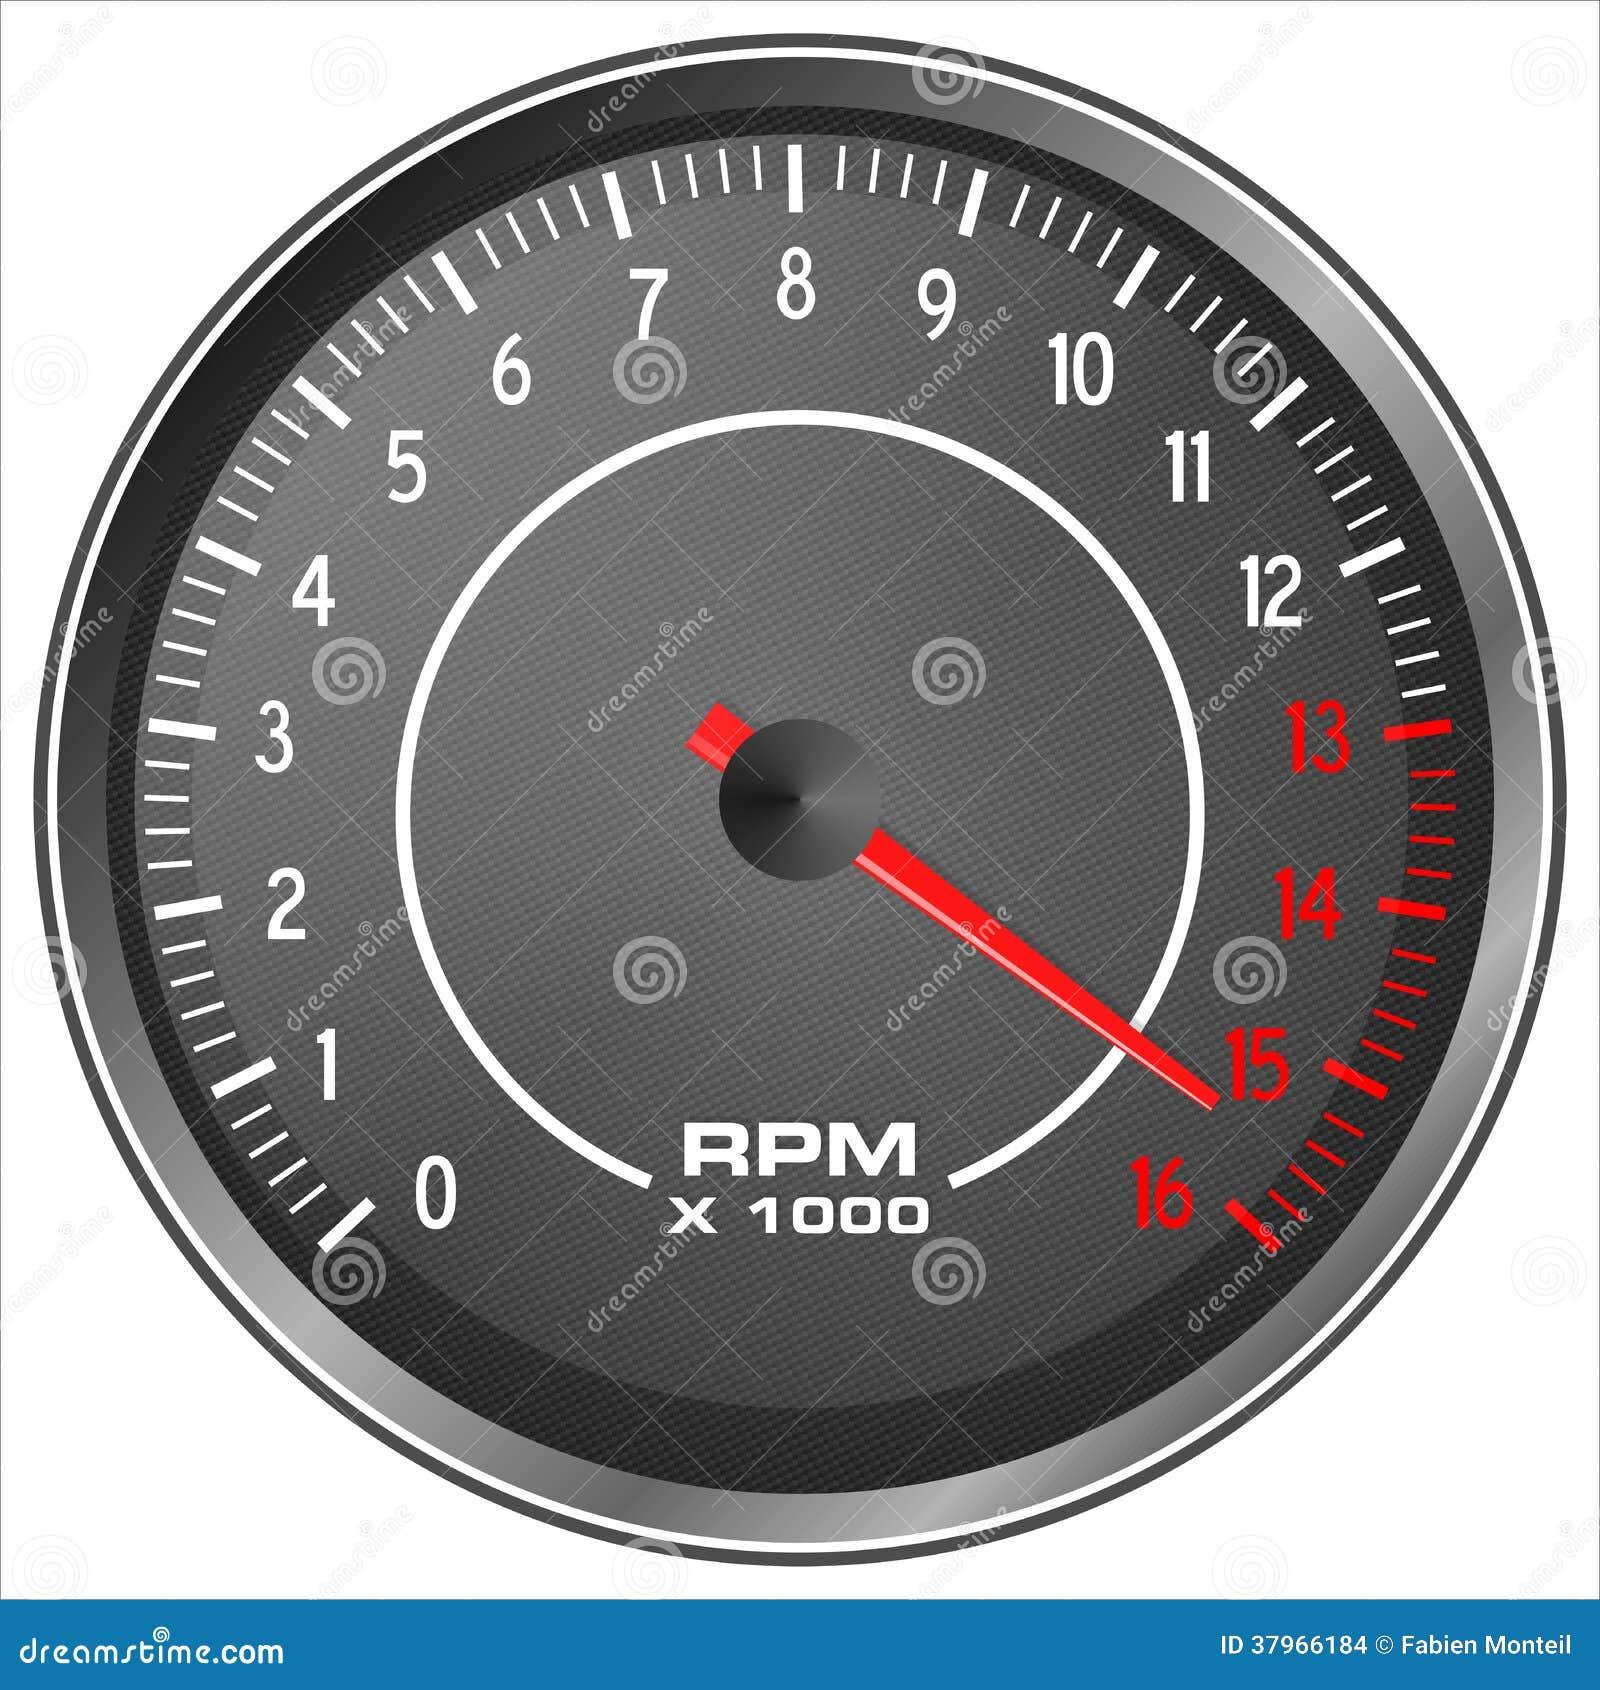 Motorbike Tachometer Stock Images